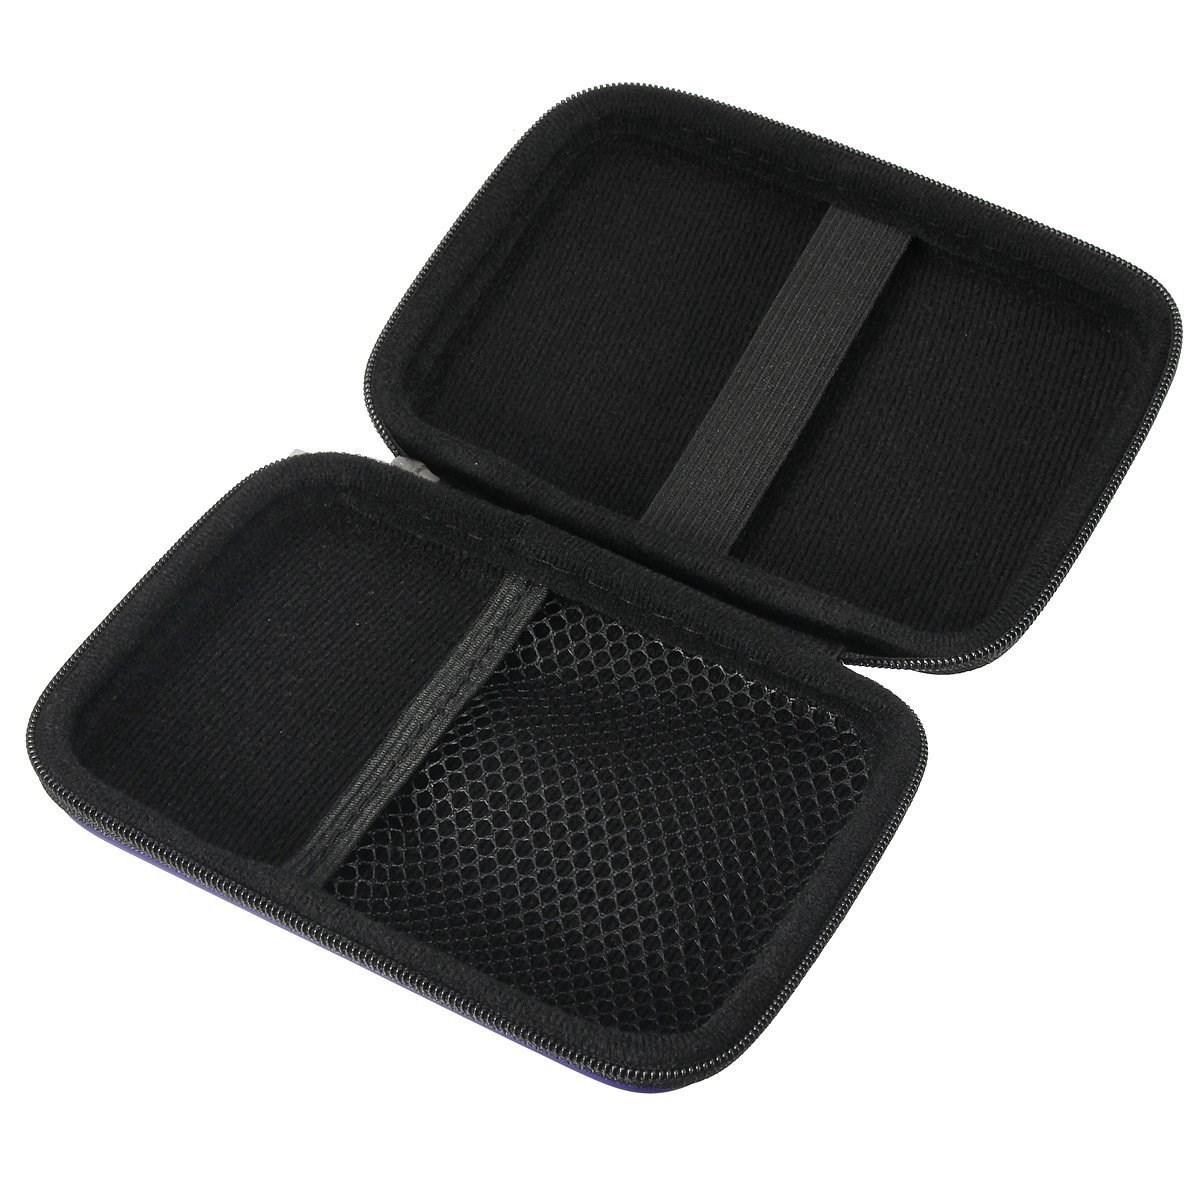 Portable Hard Disk Drive Shockproof Zipper Cover Bag Case 2.